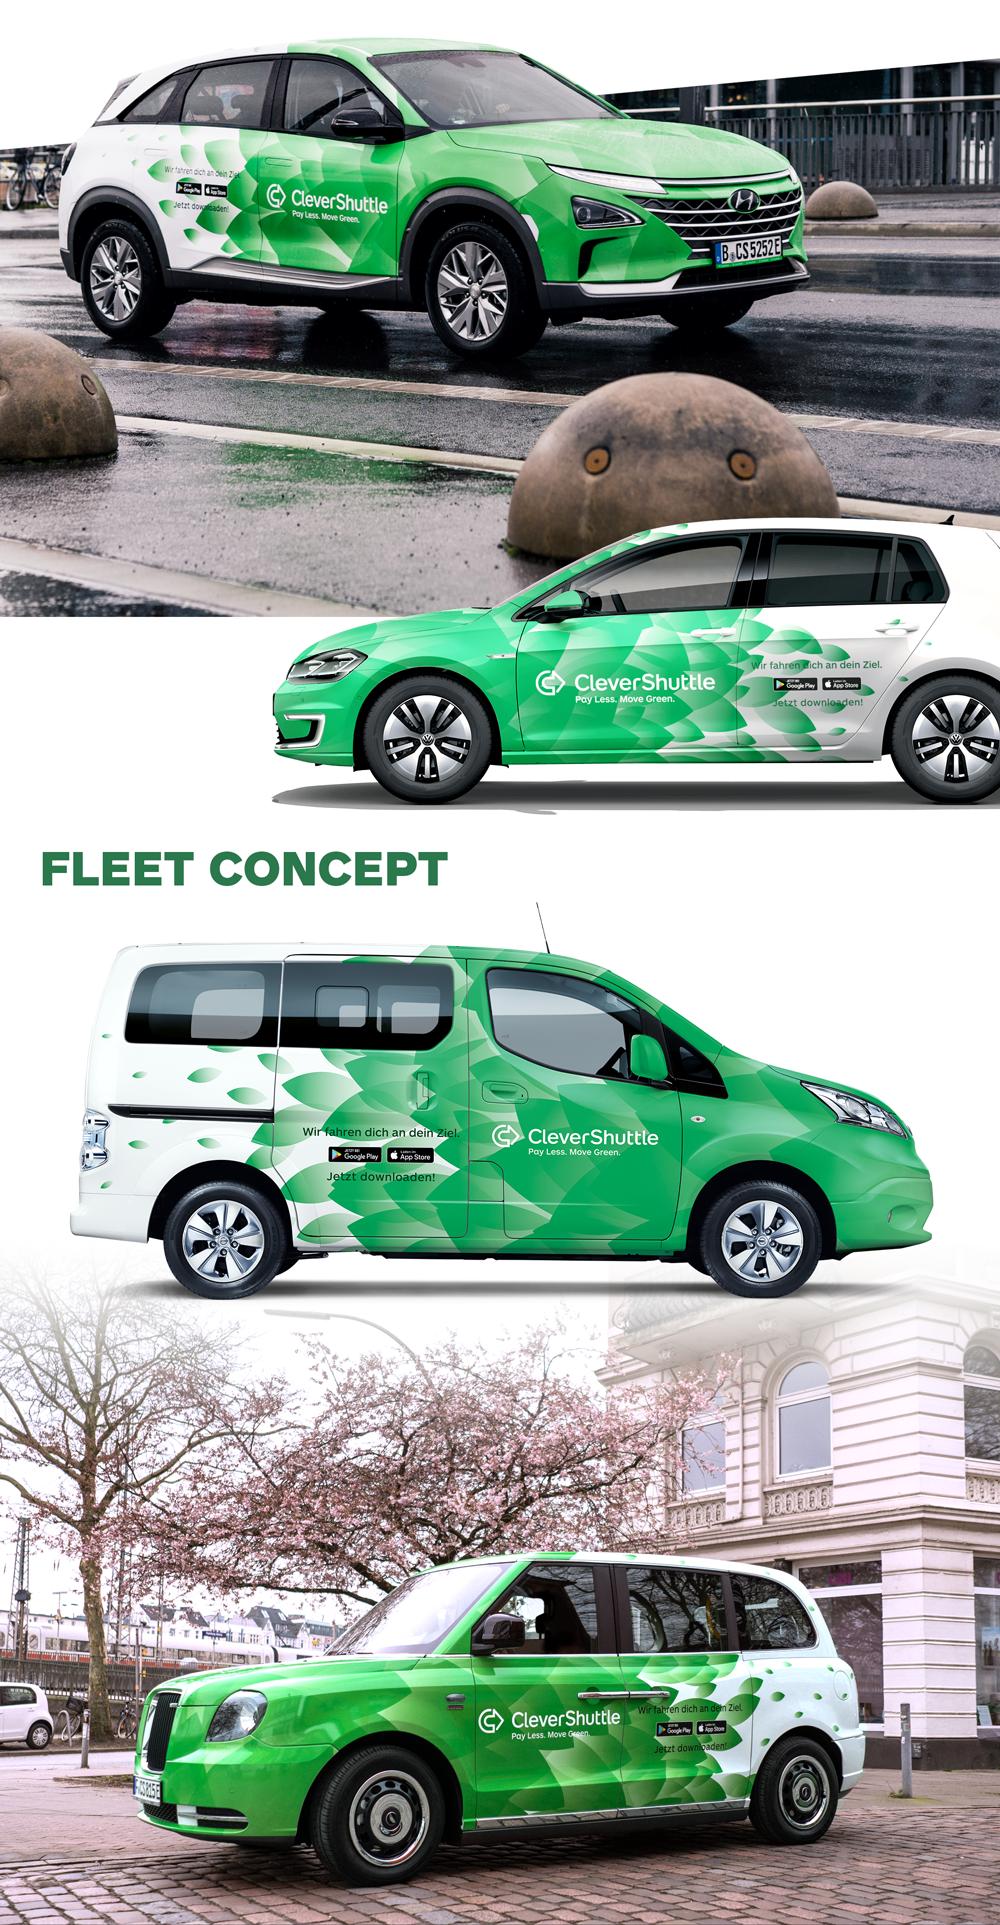 CleverShuttle fleet design and concept.